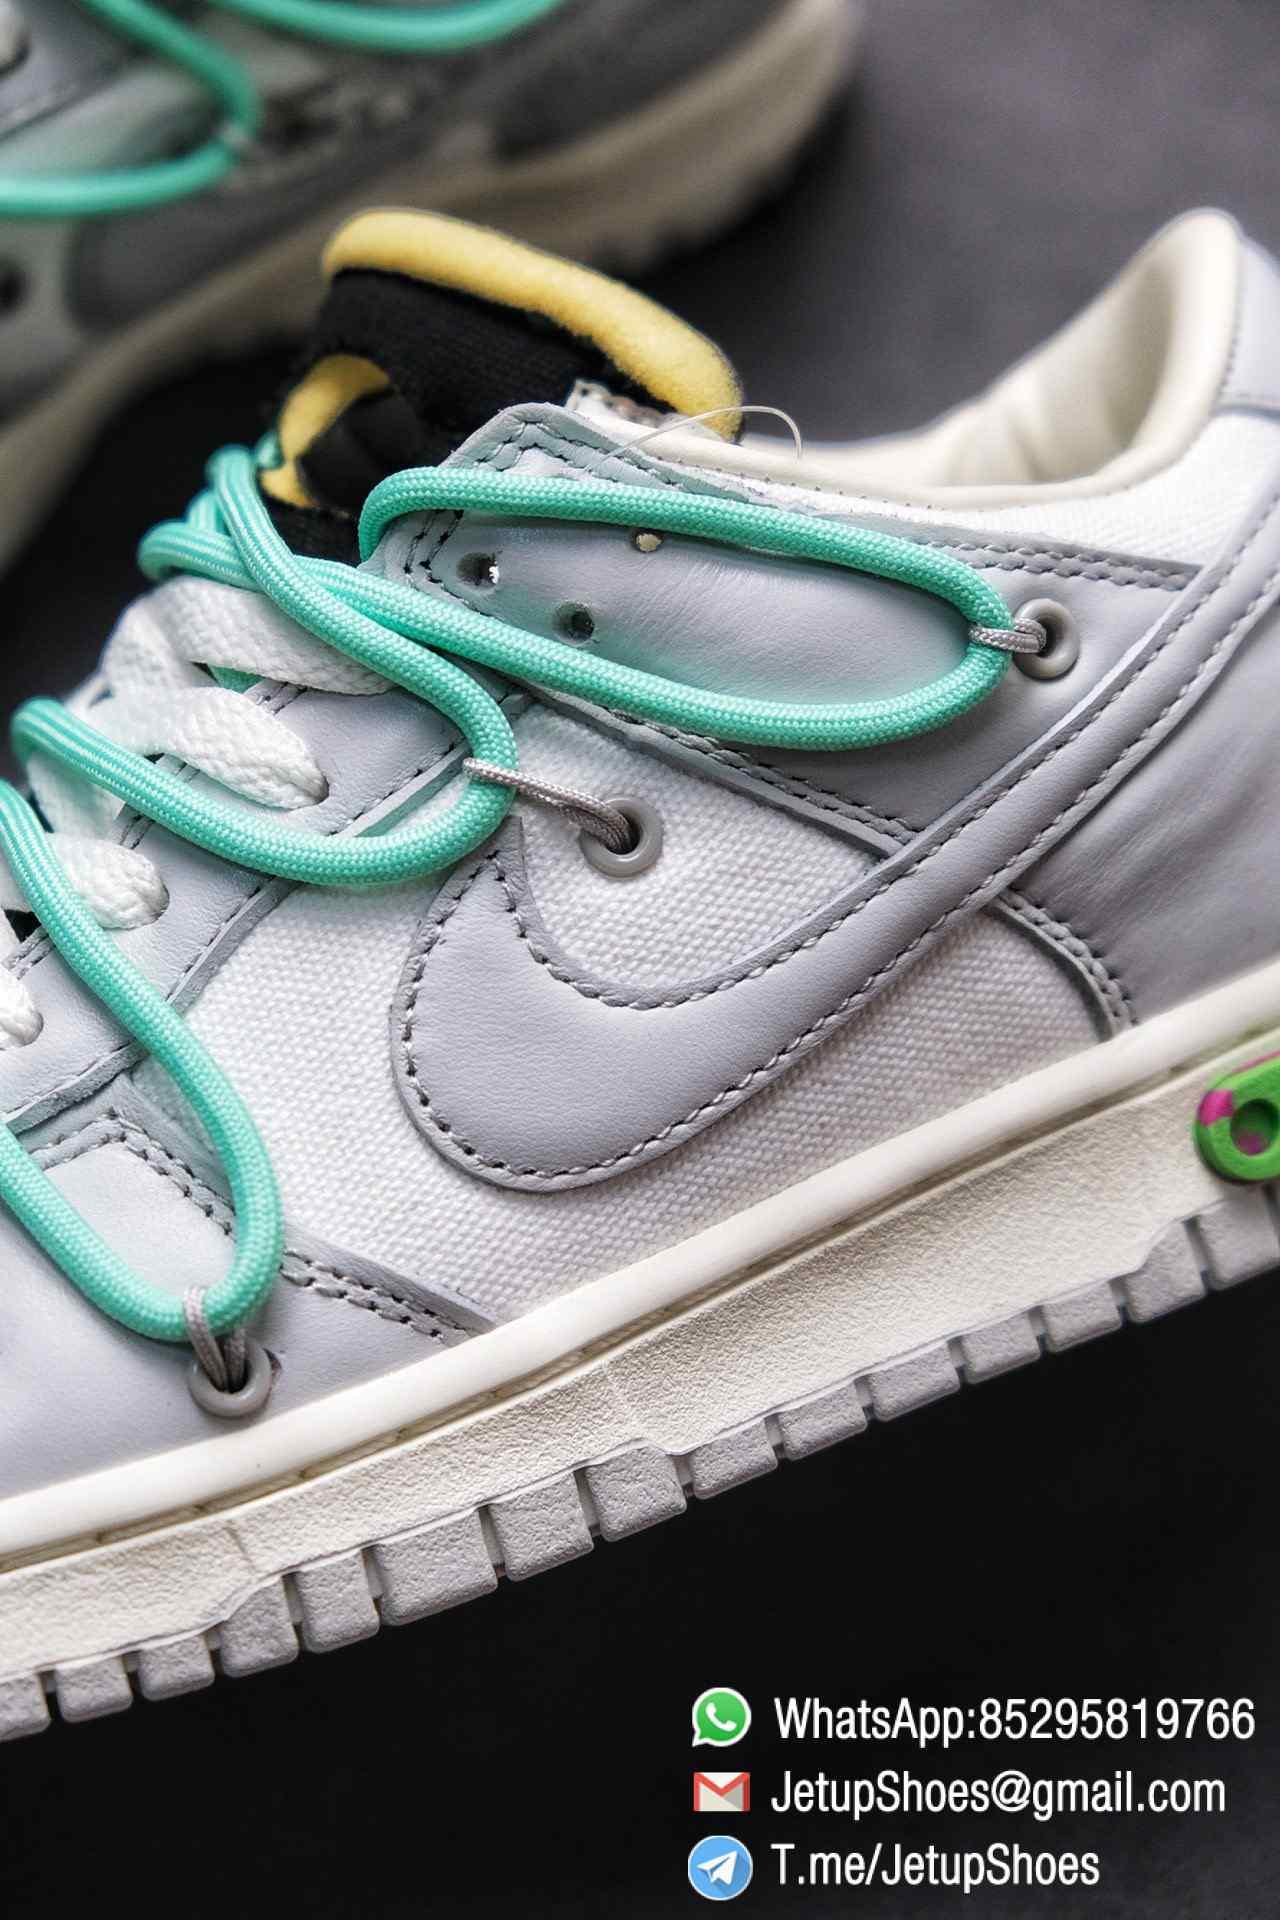 Best Replica Nike Sneakers 0ff White x Nike Dunk Low 04 of 50 SKU DM1602 114 Top RepSneakers Supplier 07